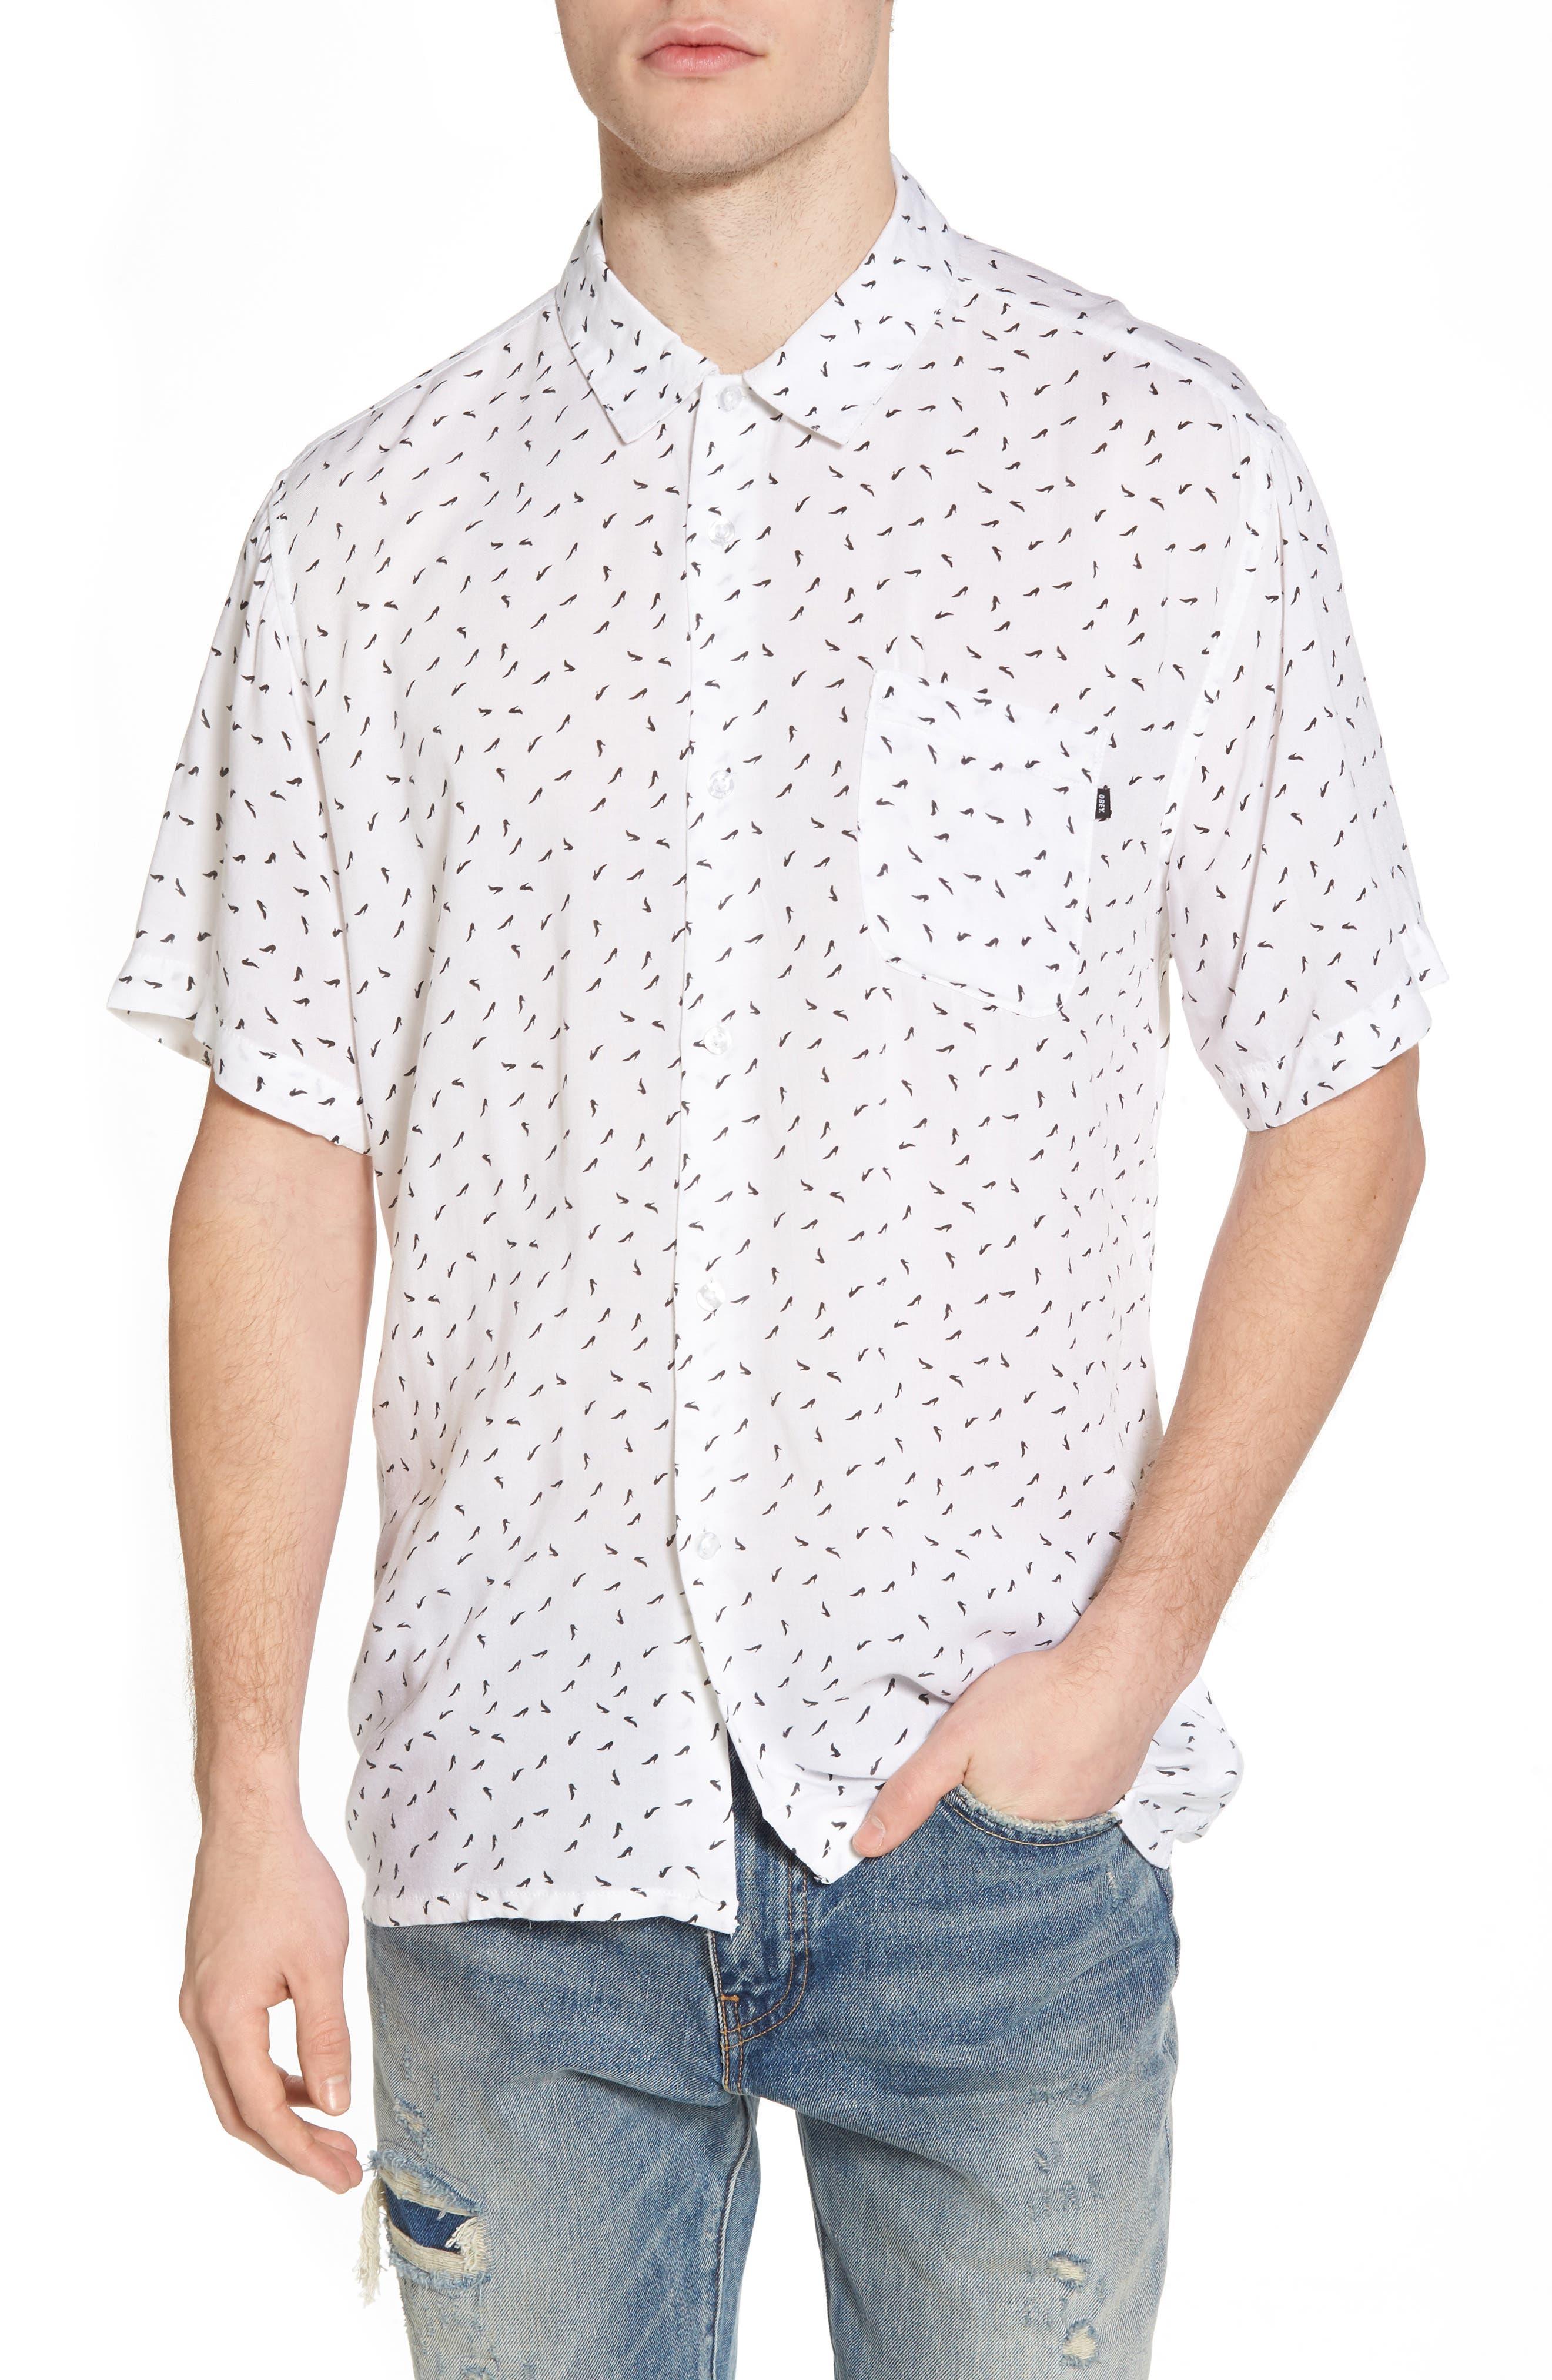 Pumps Short Sleeve Shirt,                         Main,                         color, White Multi